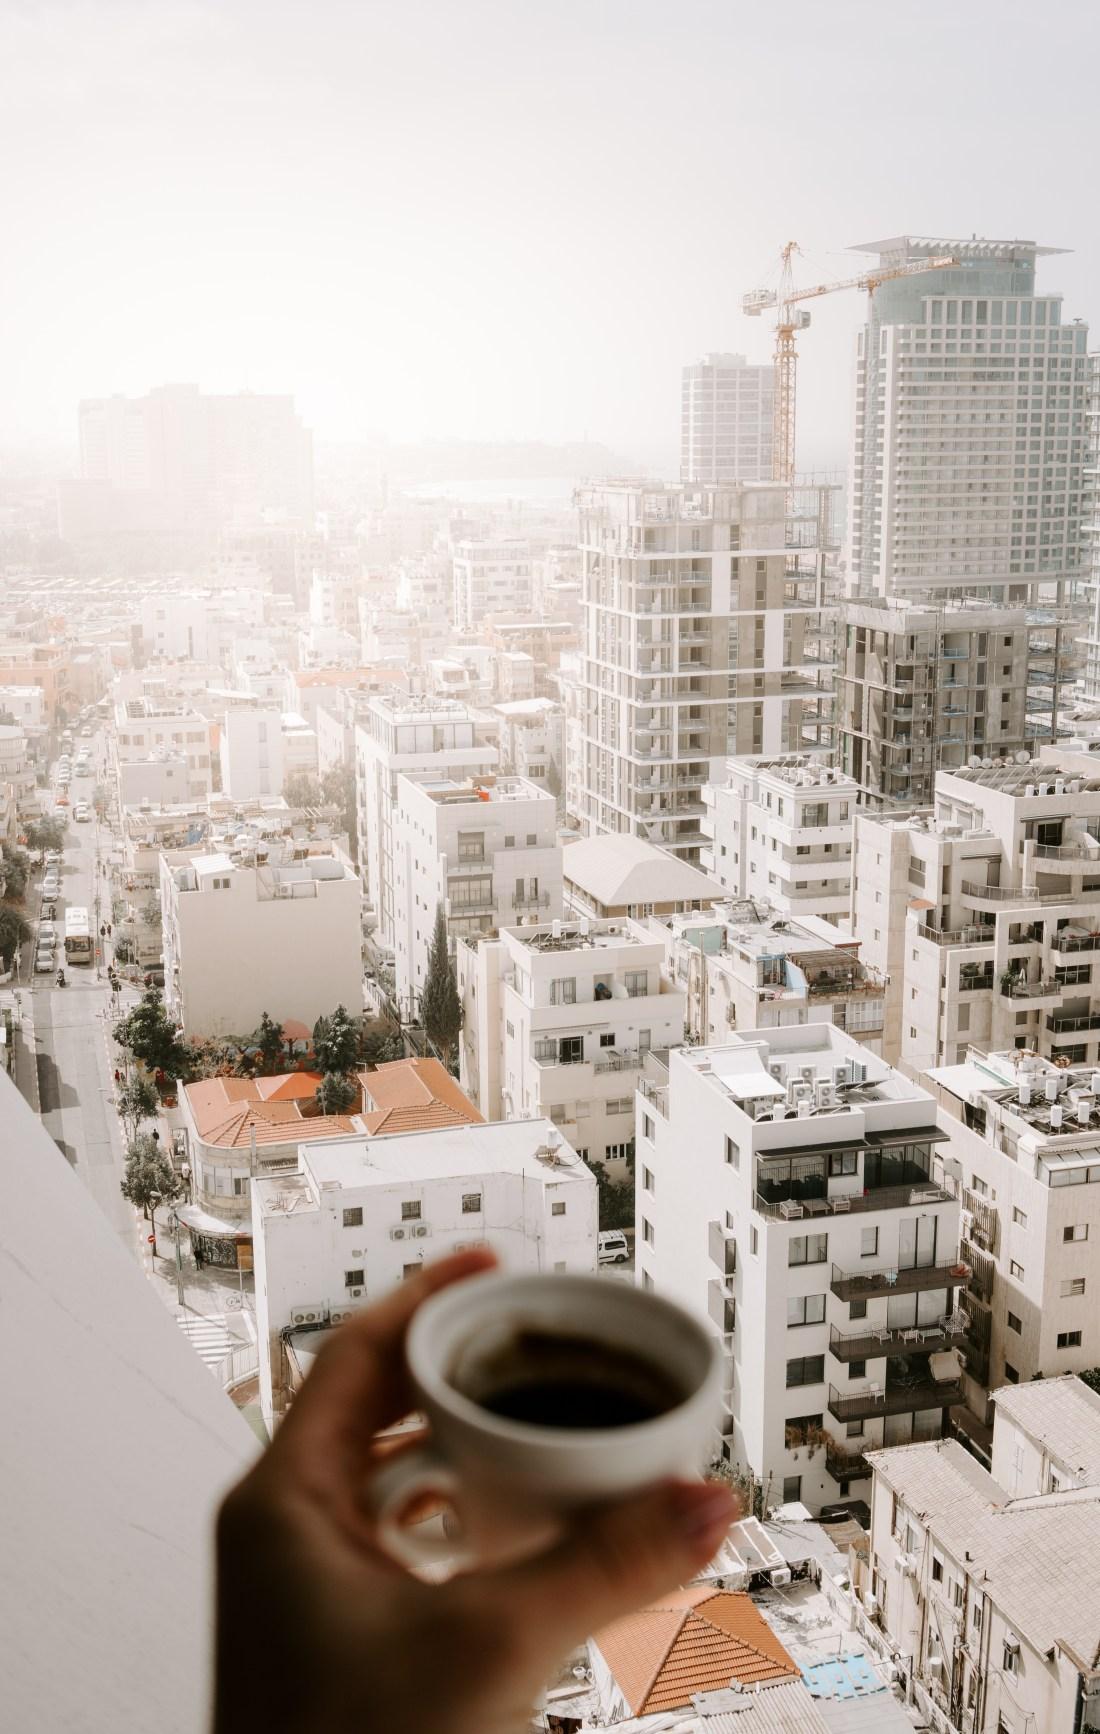 tel awiw blog izrael tel aviv